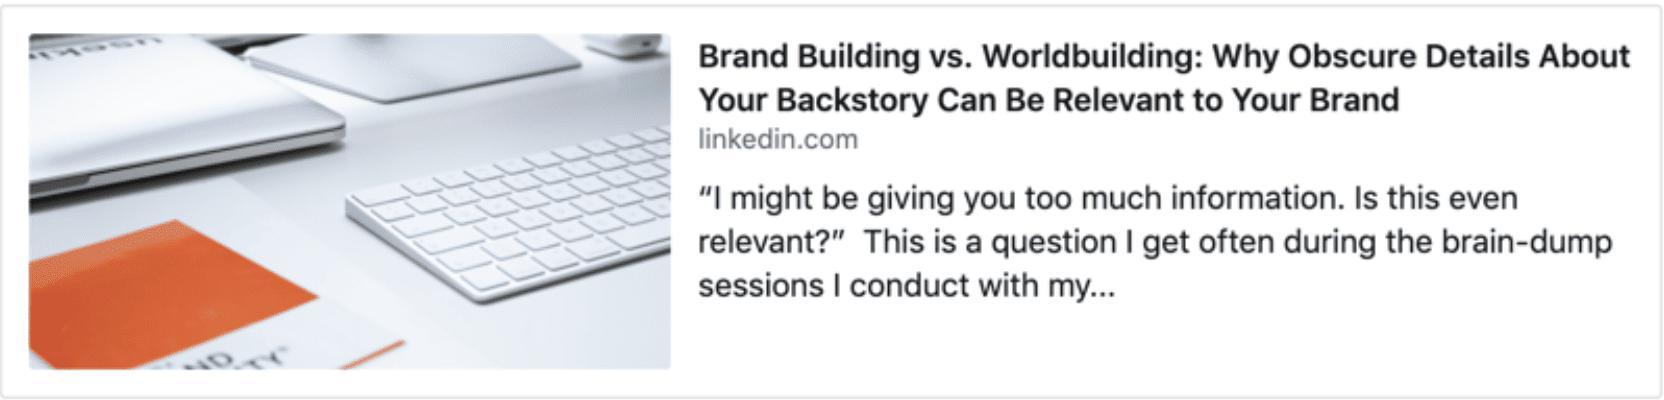 LinkedIn article image size